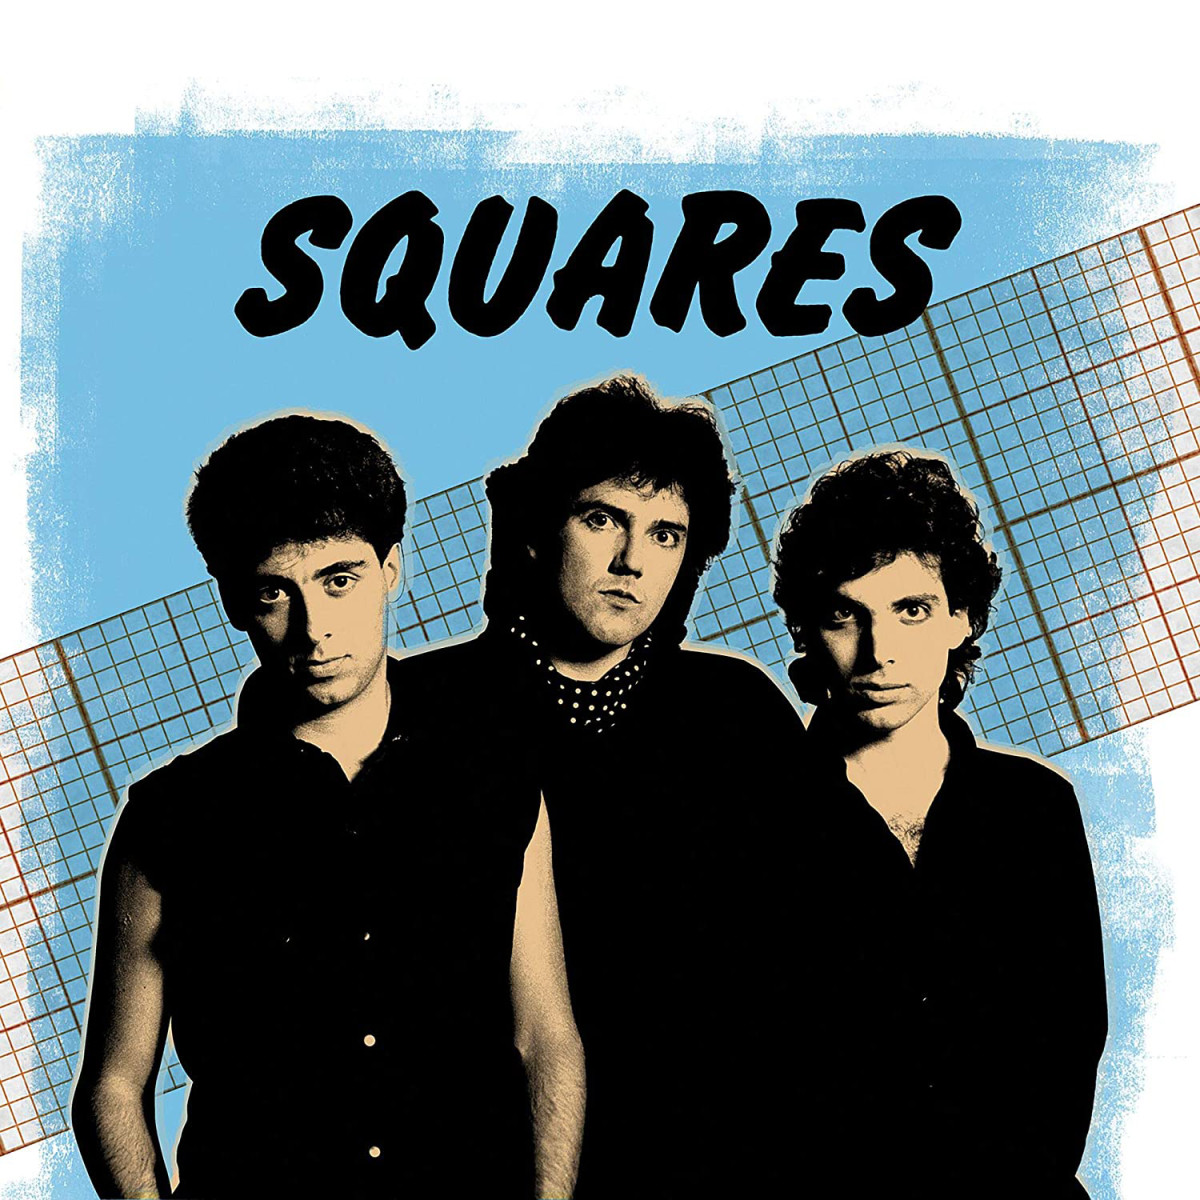 The Squares anthology